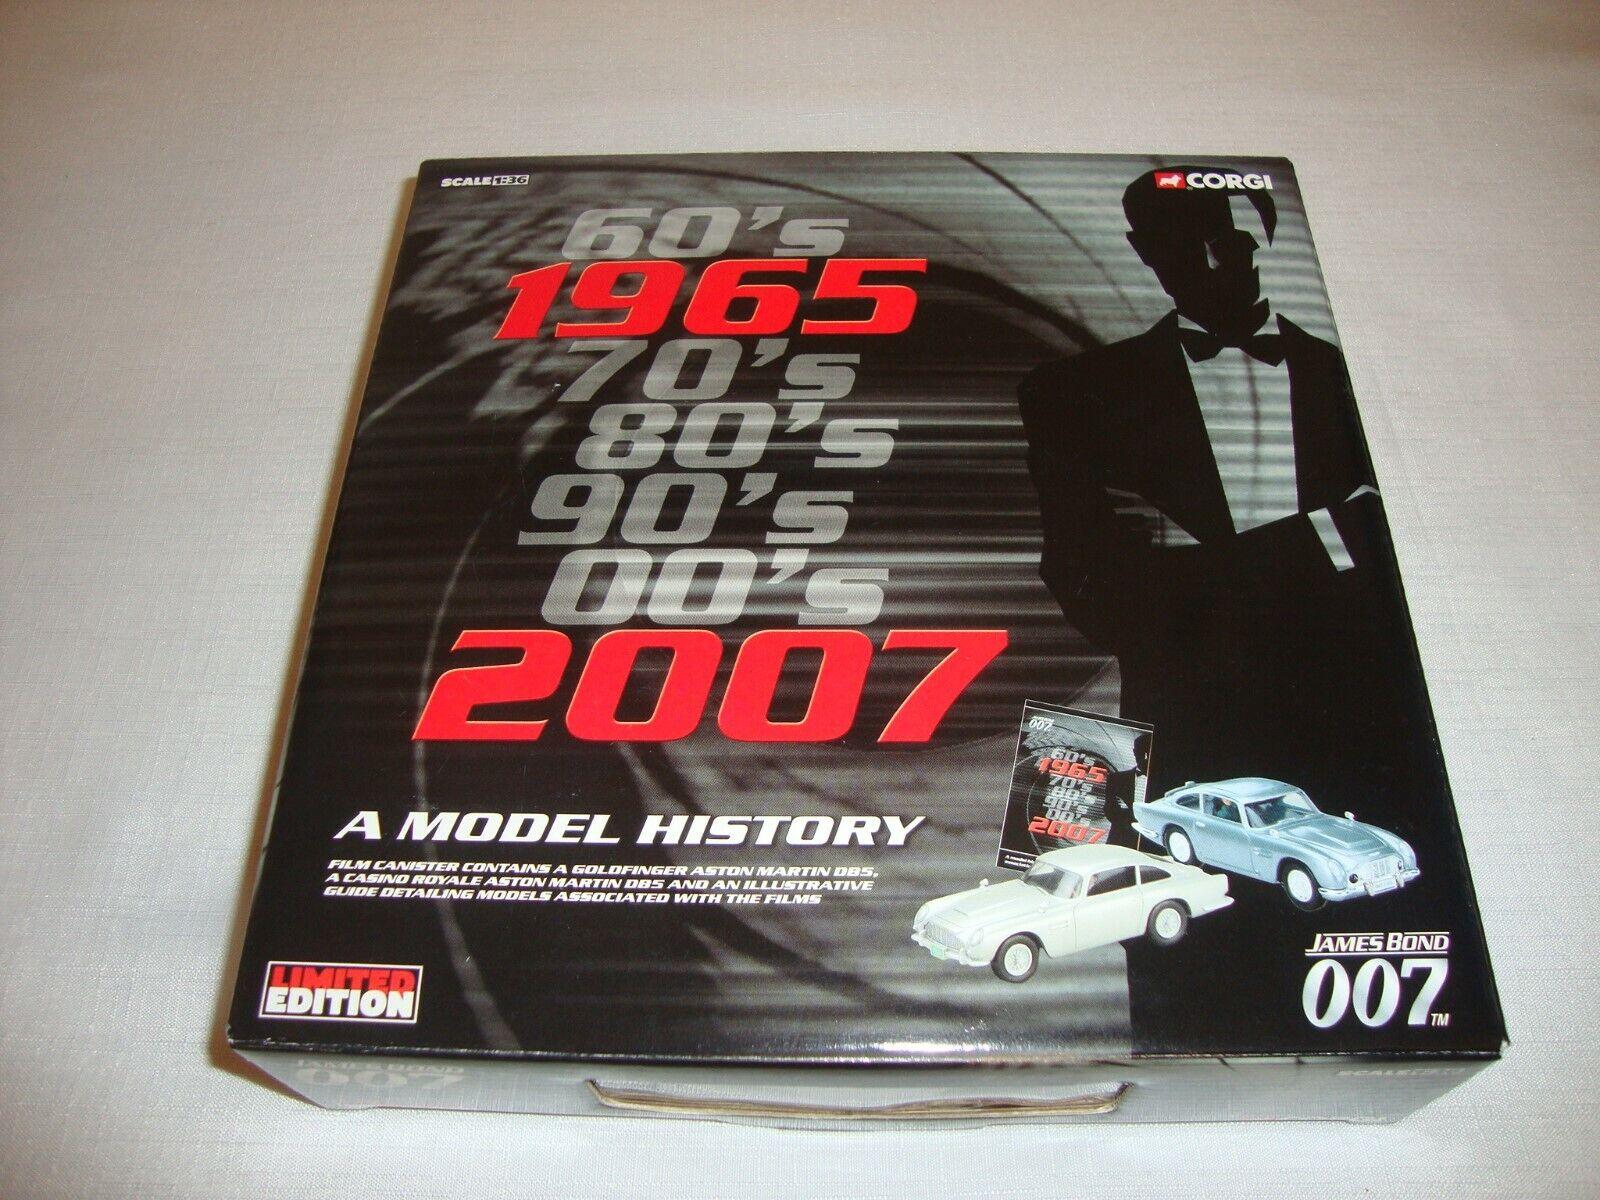 CORGI CC93989 1965 TO 2007 JAMES BOND 007 'A MODEL HISTORY' 2 CAR SET